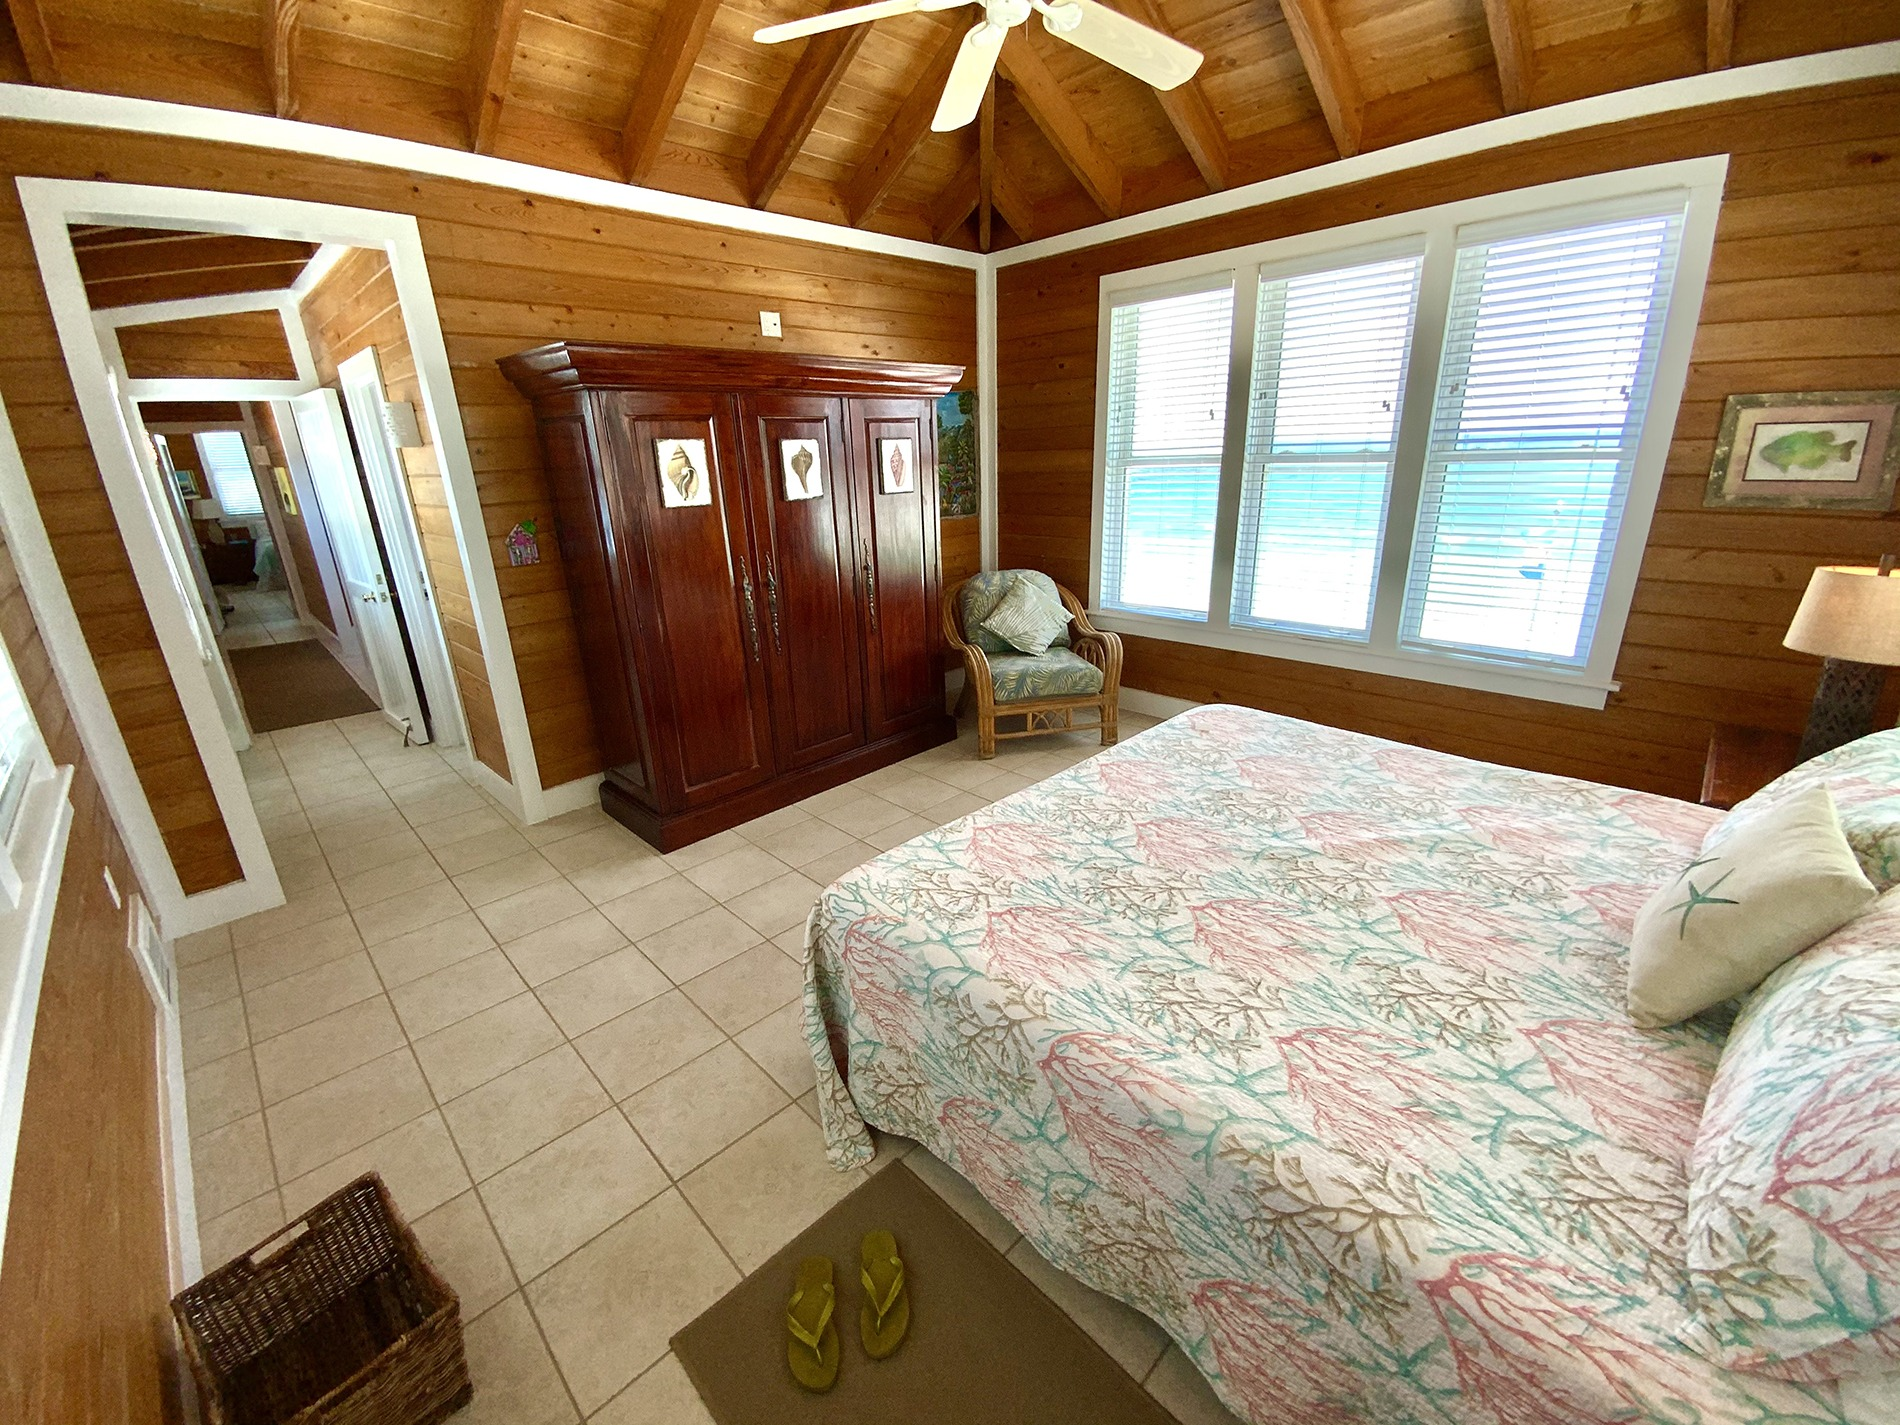 South King Master Bedroom